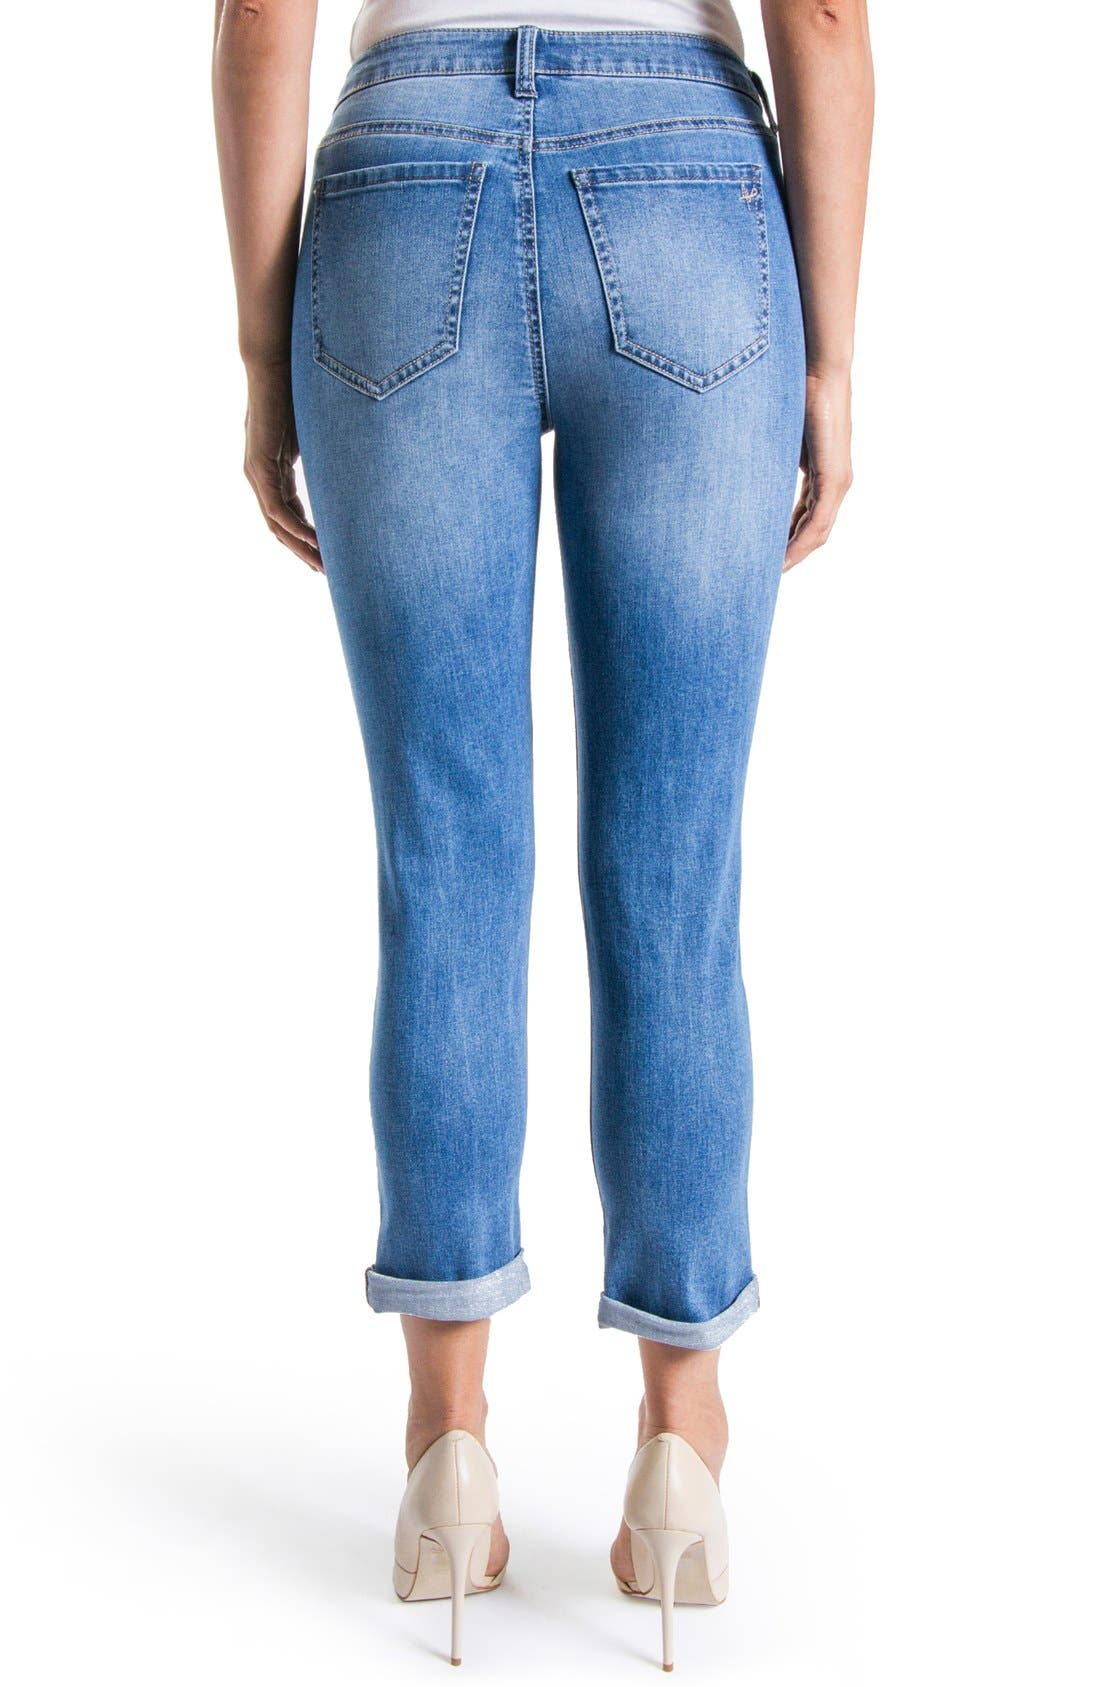 Alternate Image 2  - Liverpool Jeans Company 'Corey' Distressed Crop Boyfriend Jeans (Melbourne)